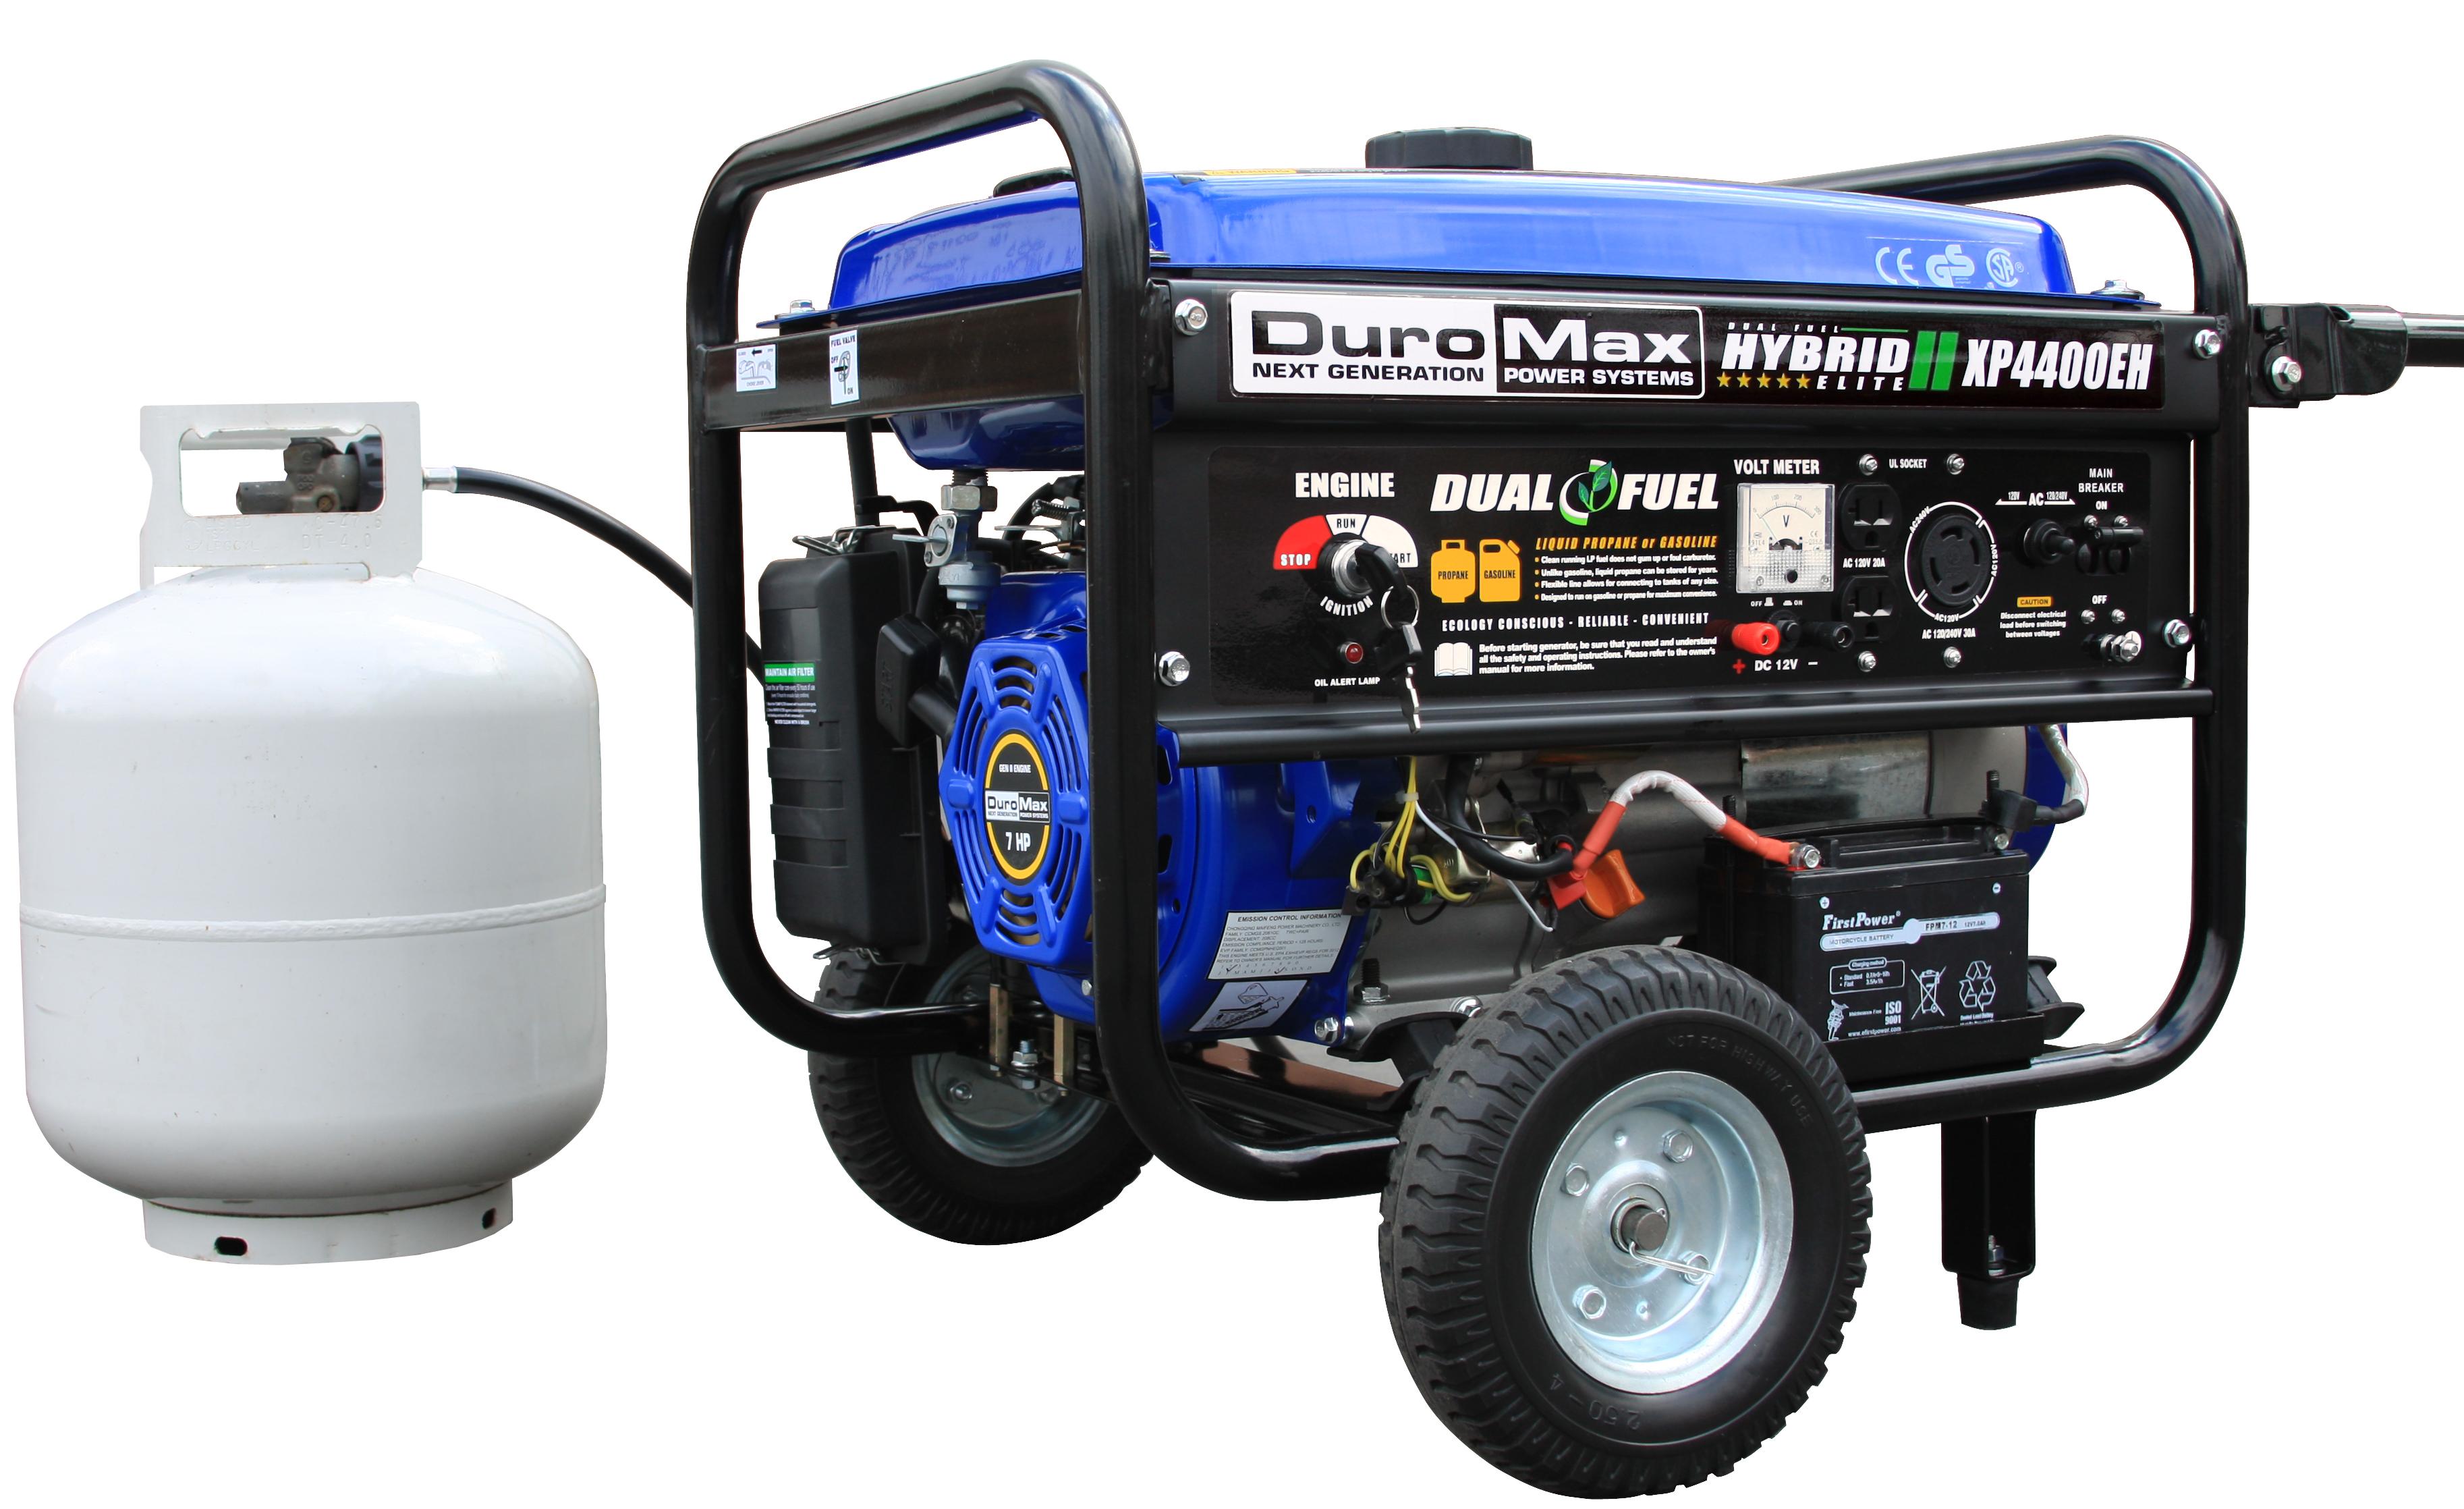 DuroMax XP4400EH Hybrid Portable Dual Fuel Propane / Gas Camping RV Generator 811640013486 | eBay